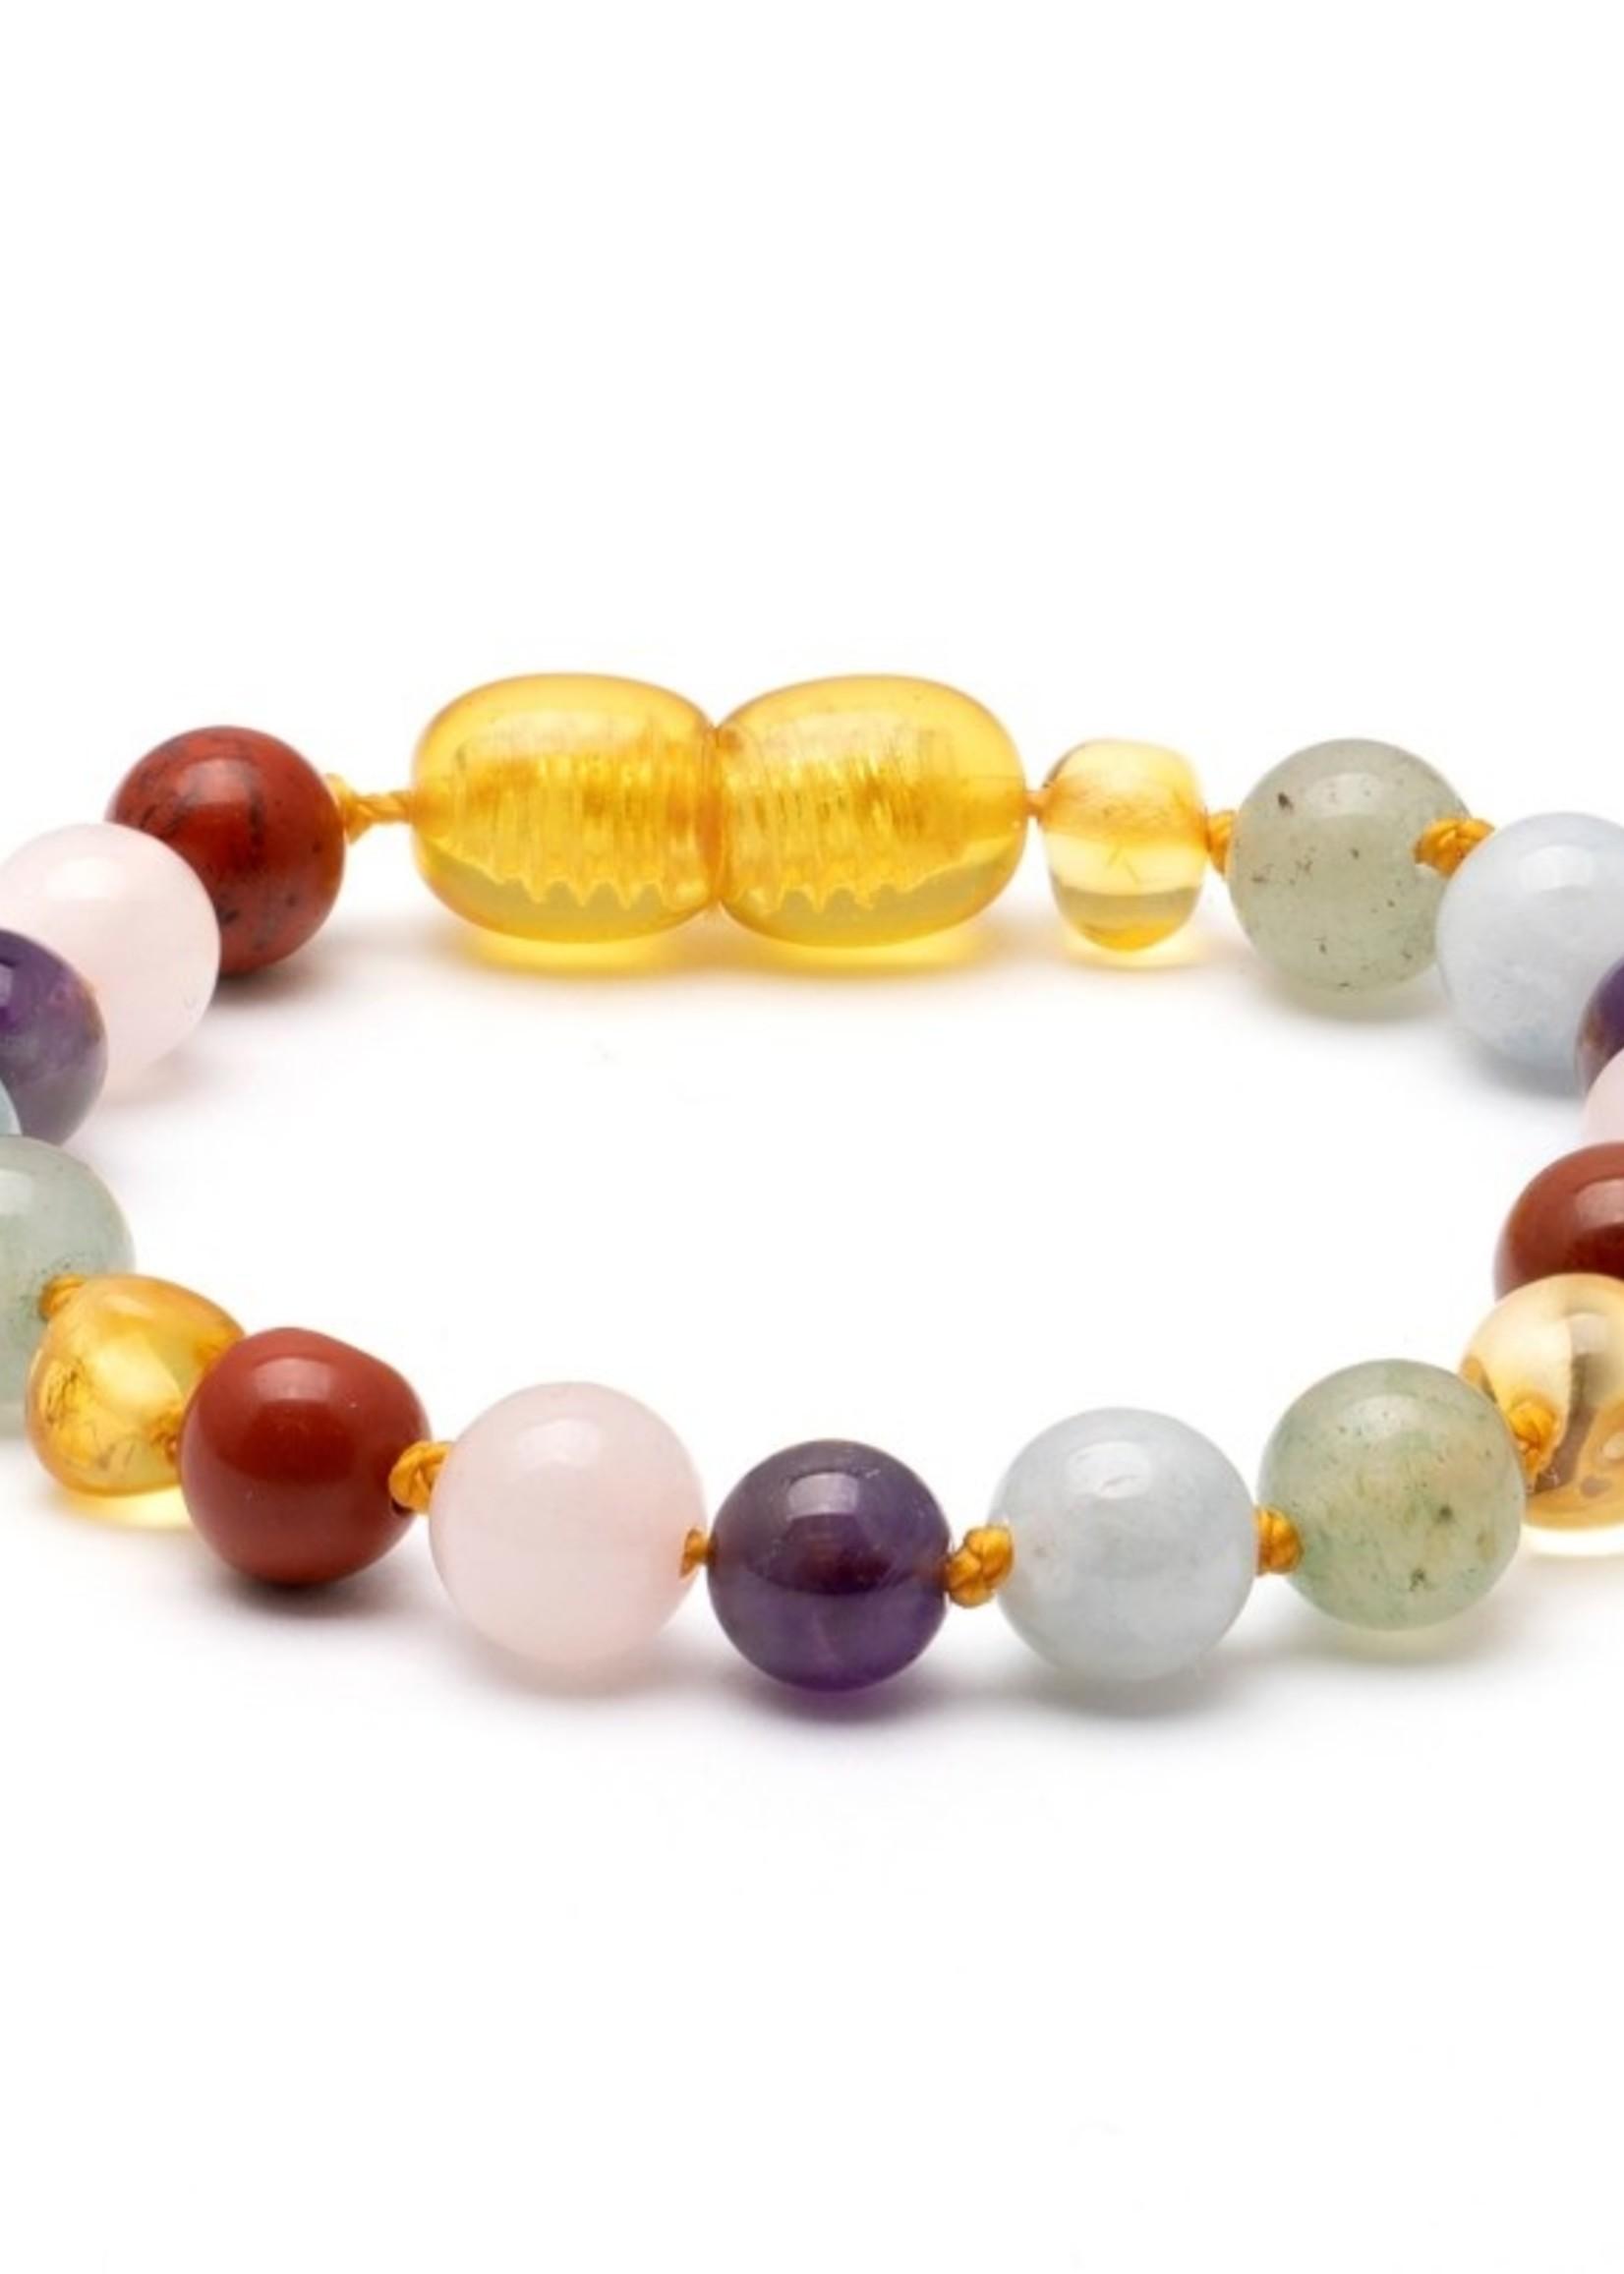 Amber Baroque Baltique Amber & Gemstone Teething Bracelet - Pastel